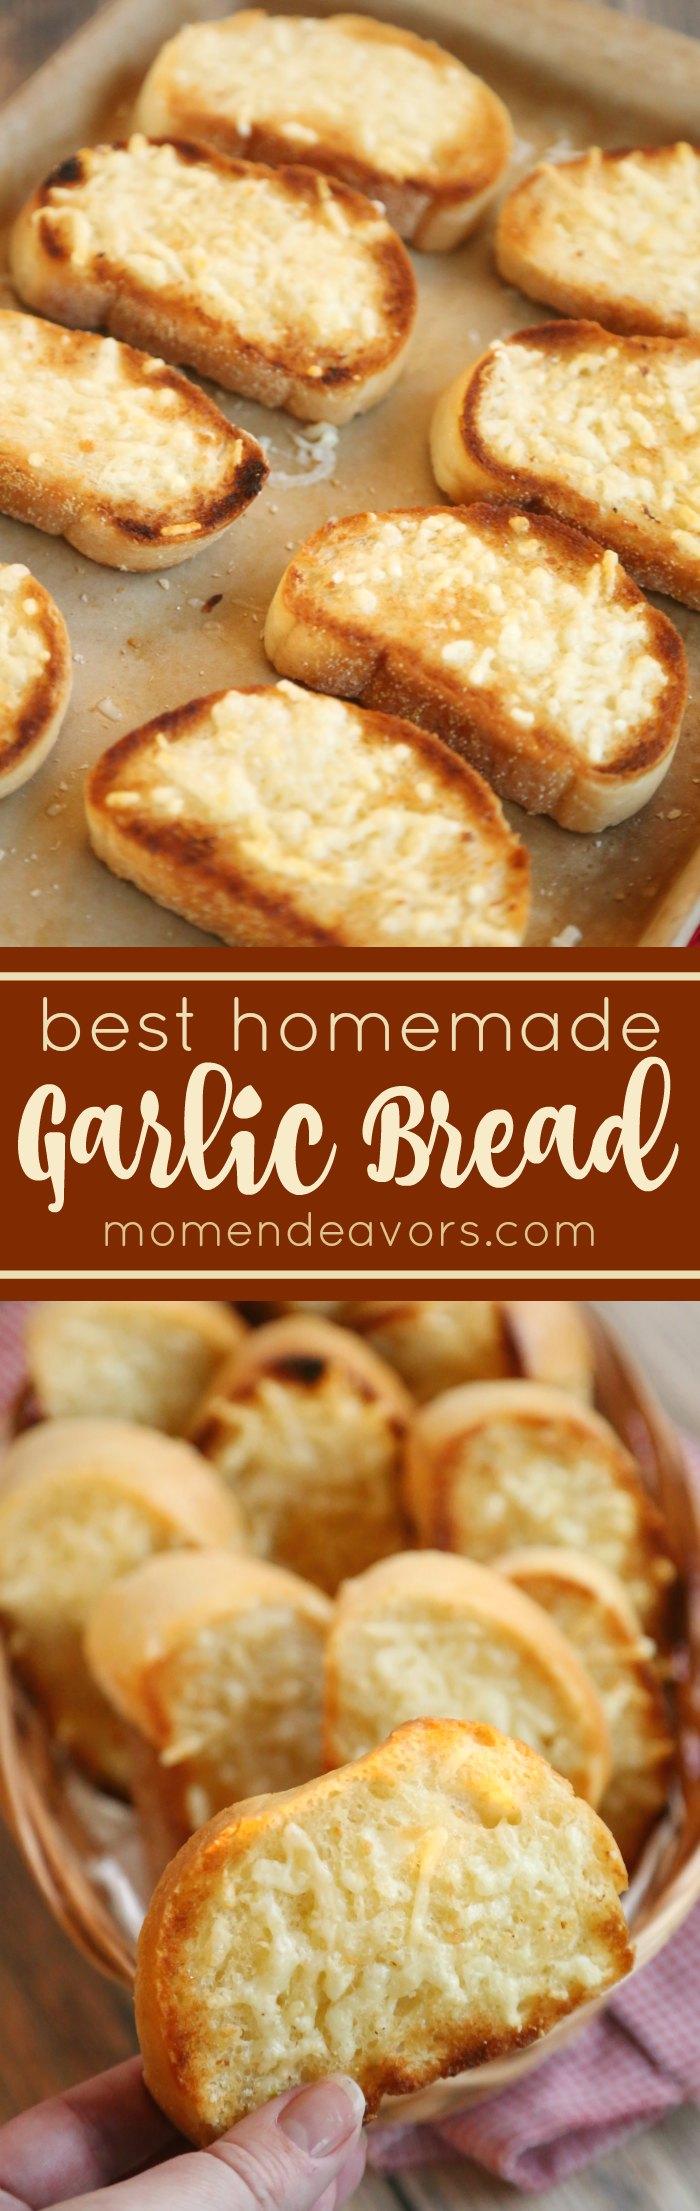 Best Homemade Garlic Bread Recipe